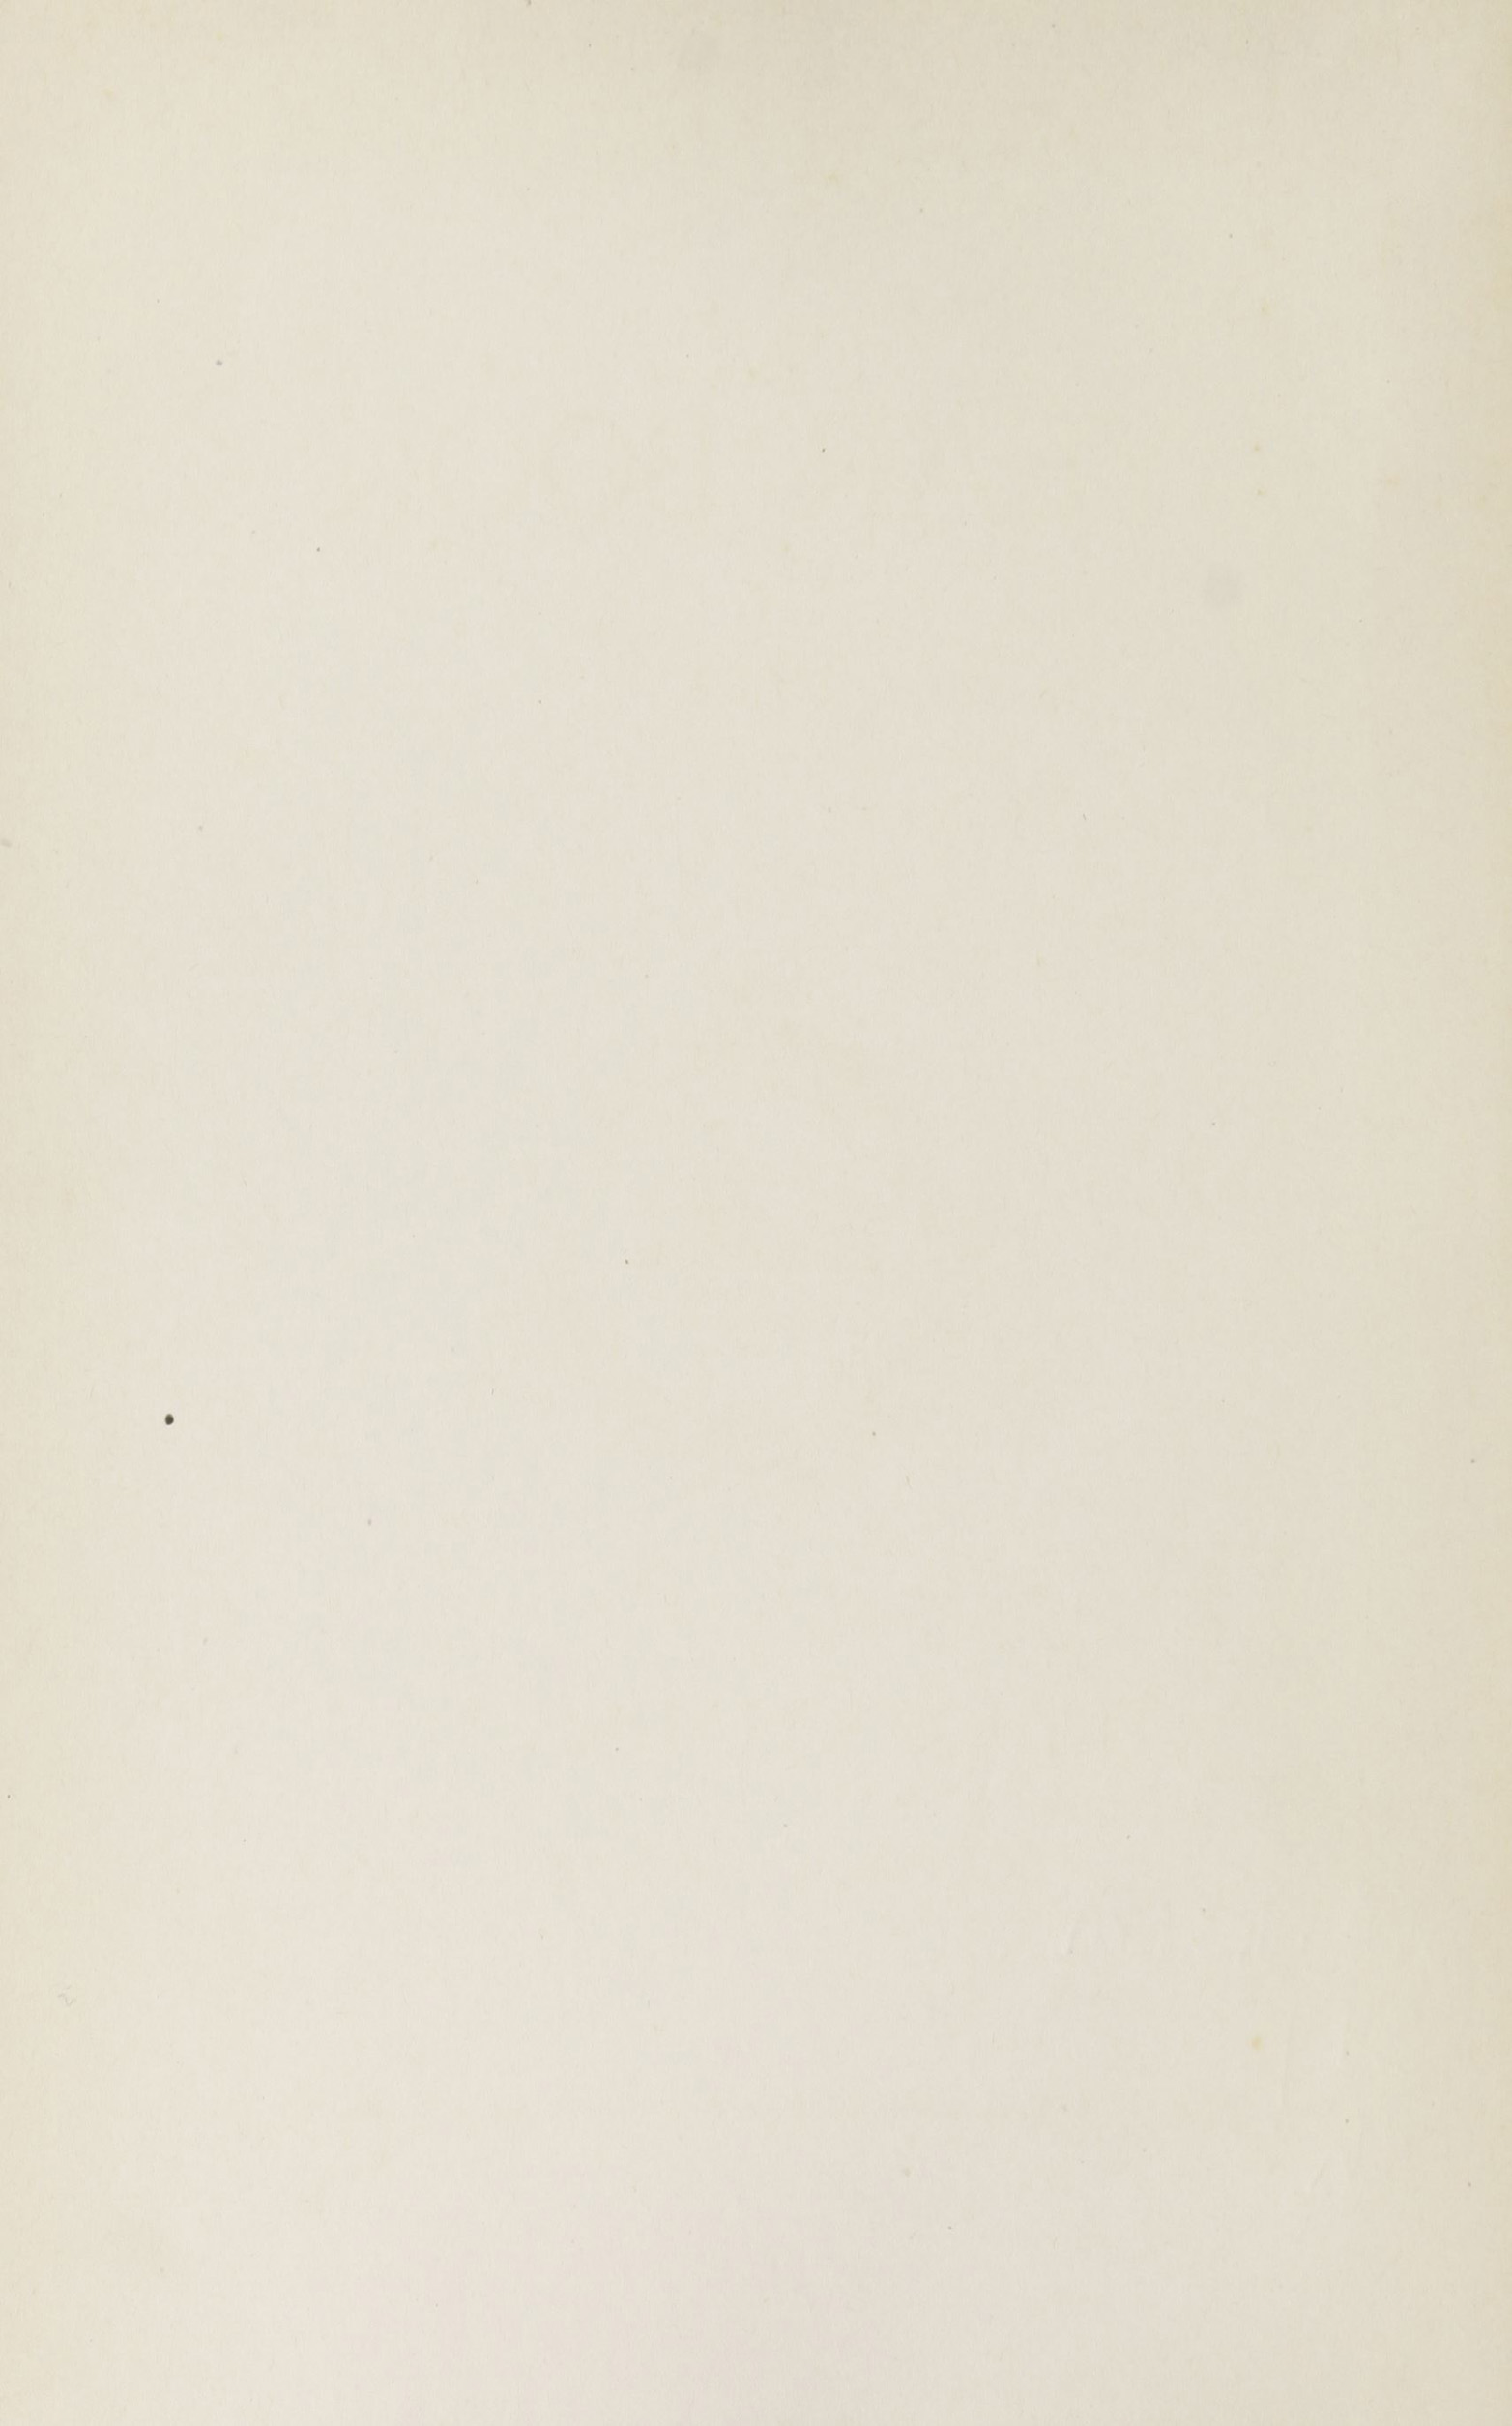 Charleston Yearbook, 1924, blank page